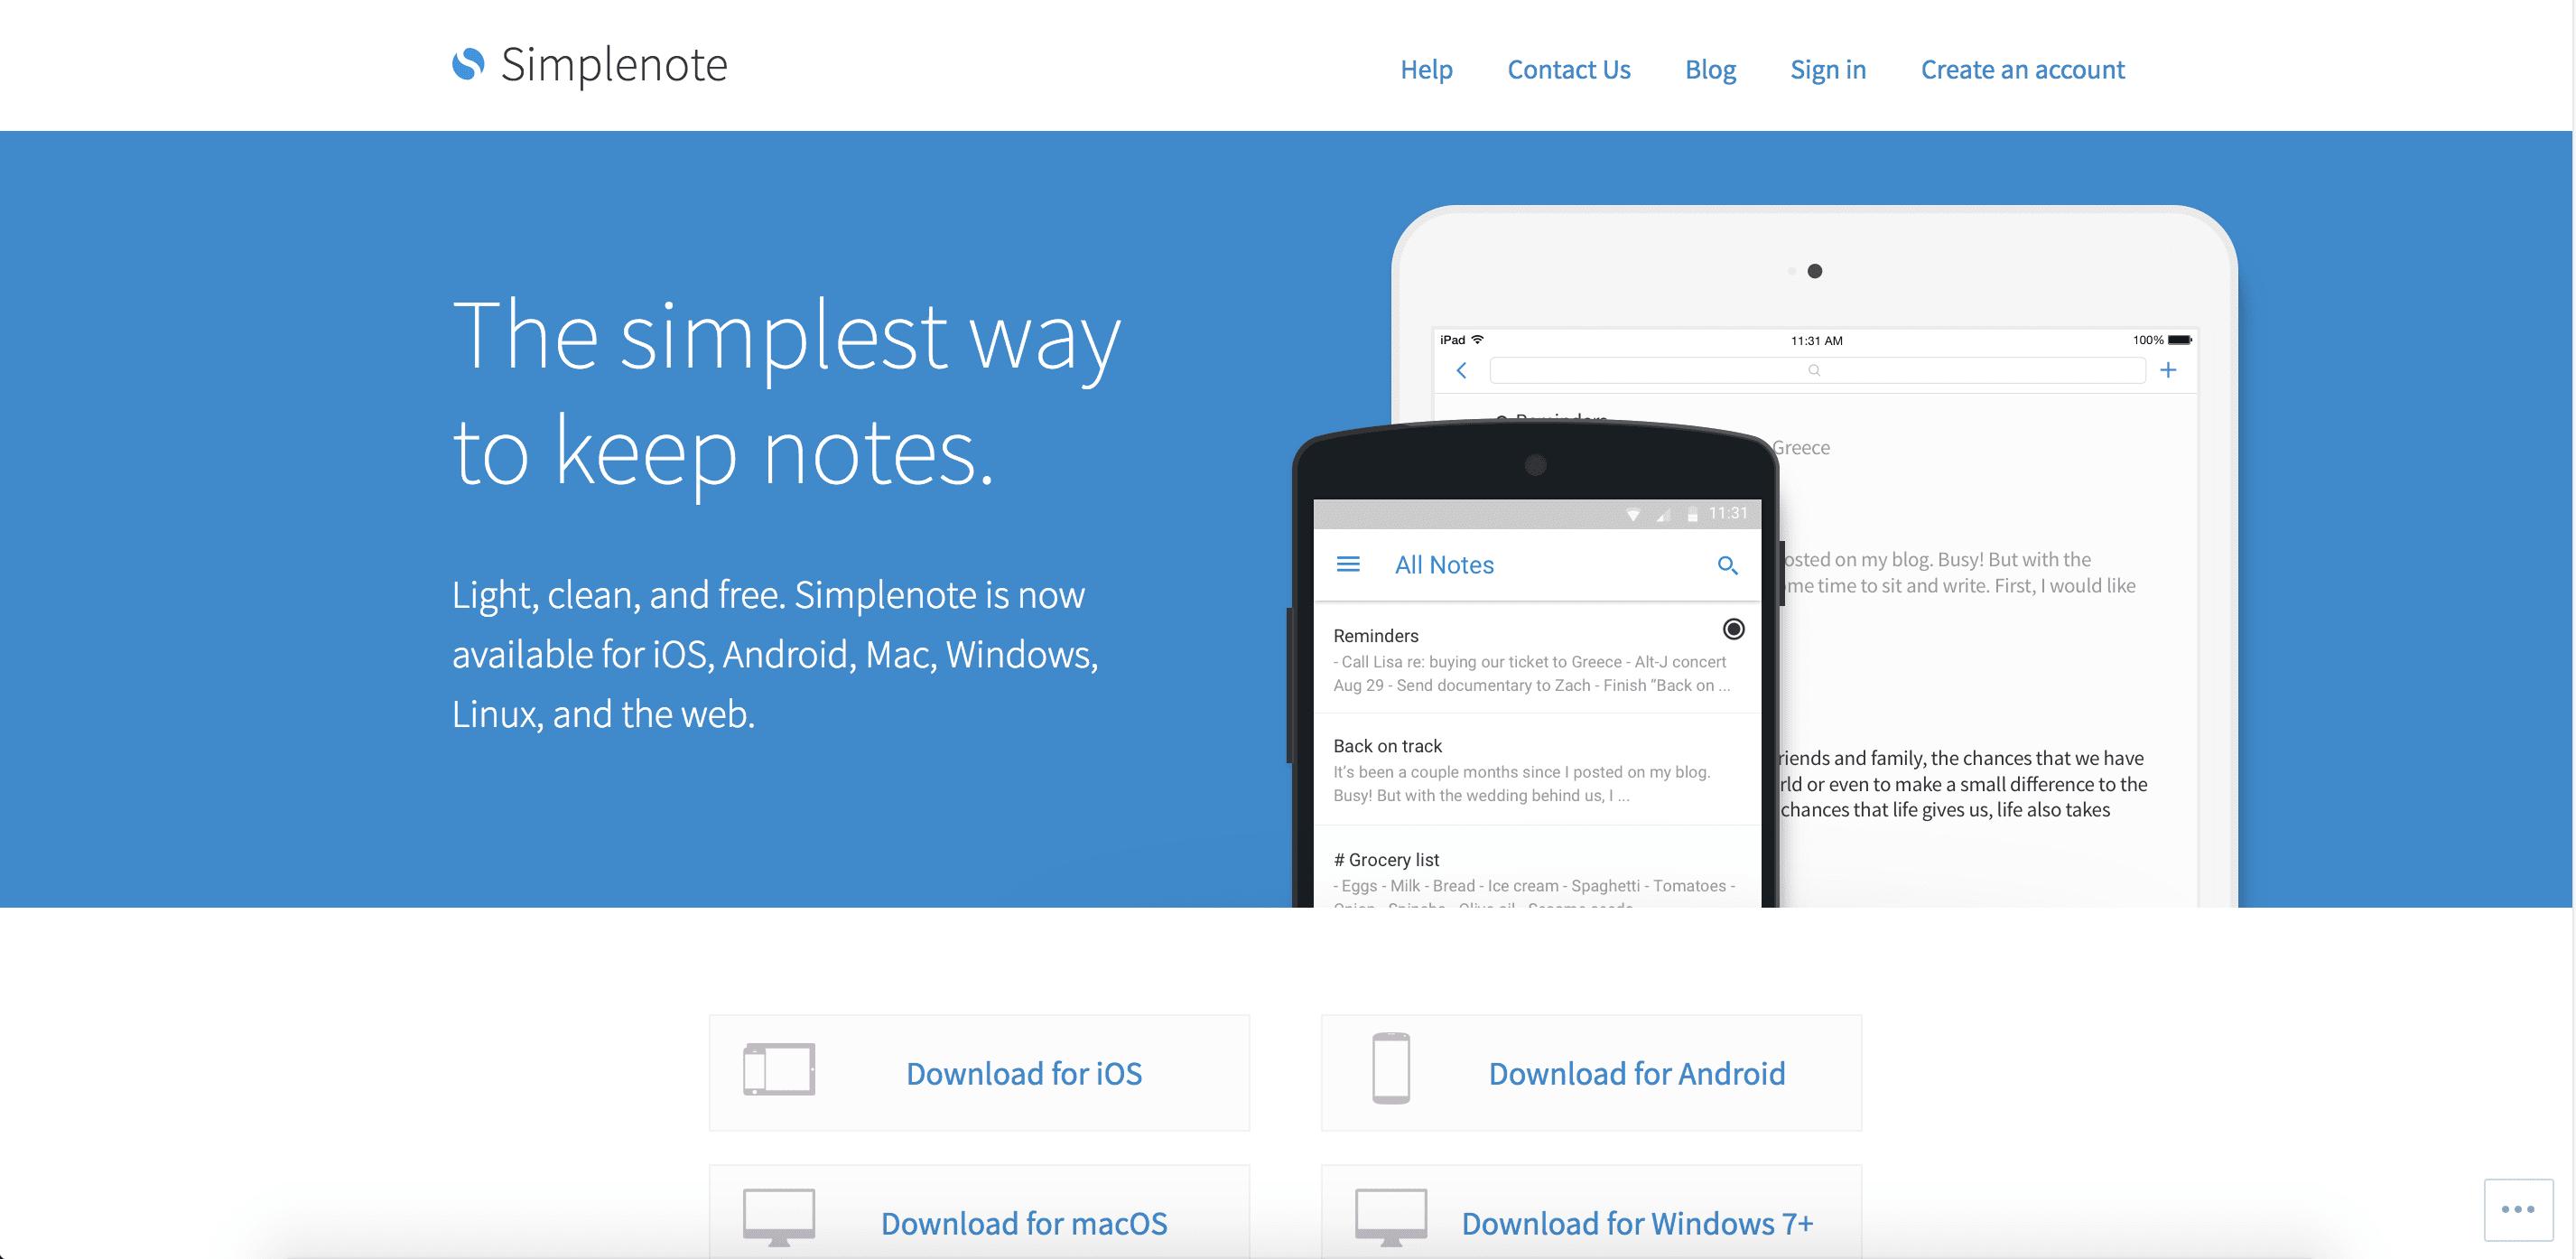 Simplenote website